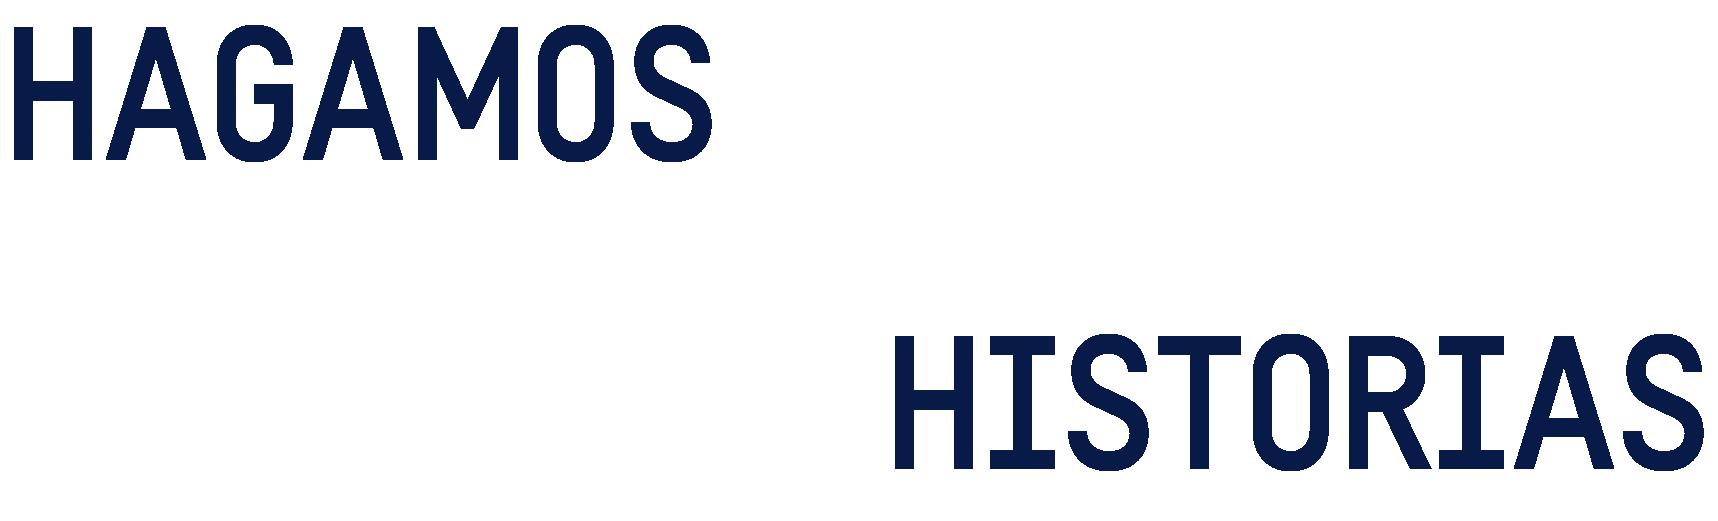 CYMA COMUNICACION - HAGAMOS HISTORIA -